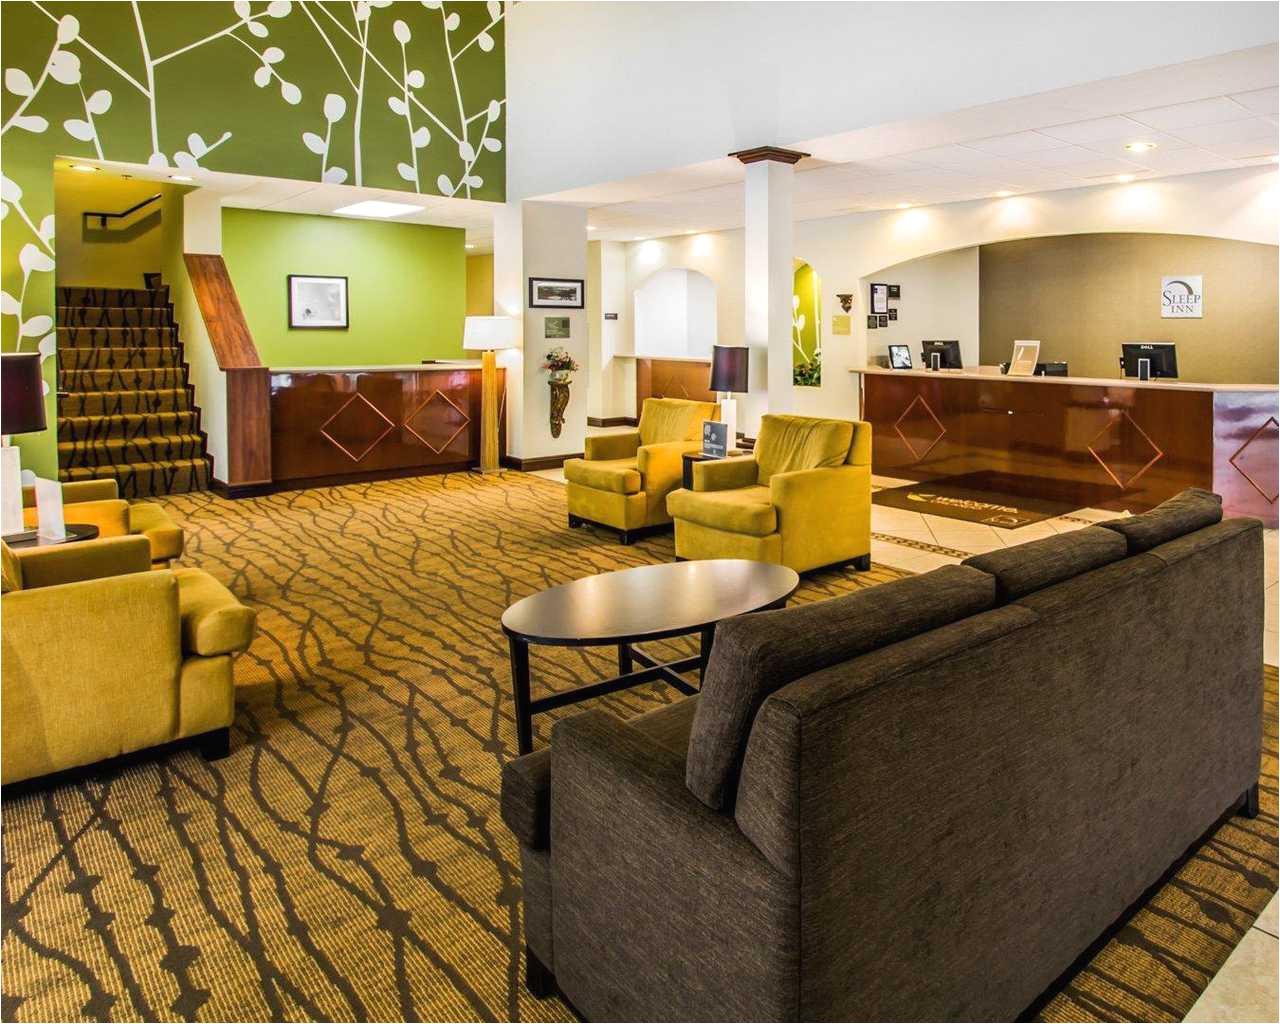 used hotel furniture orlando sleep inn orlando airport lobby 1